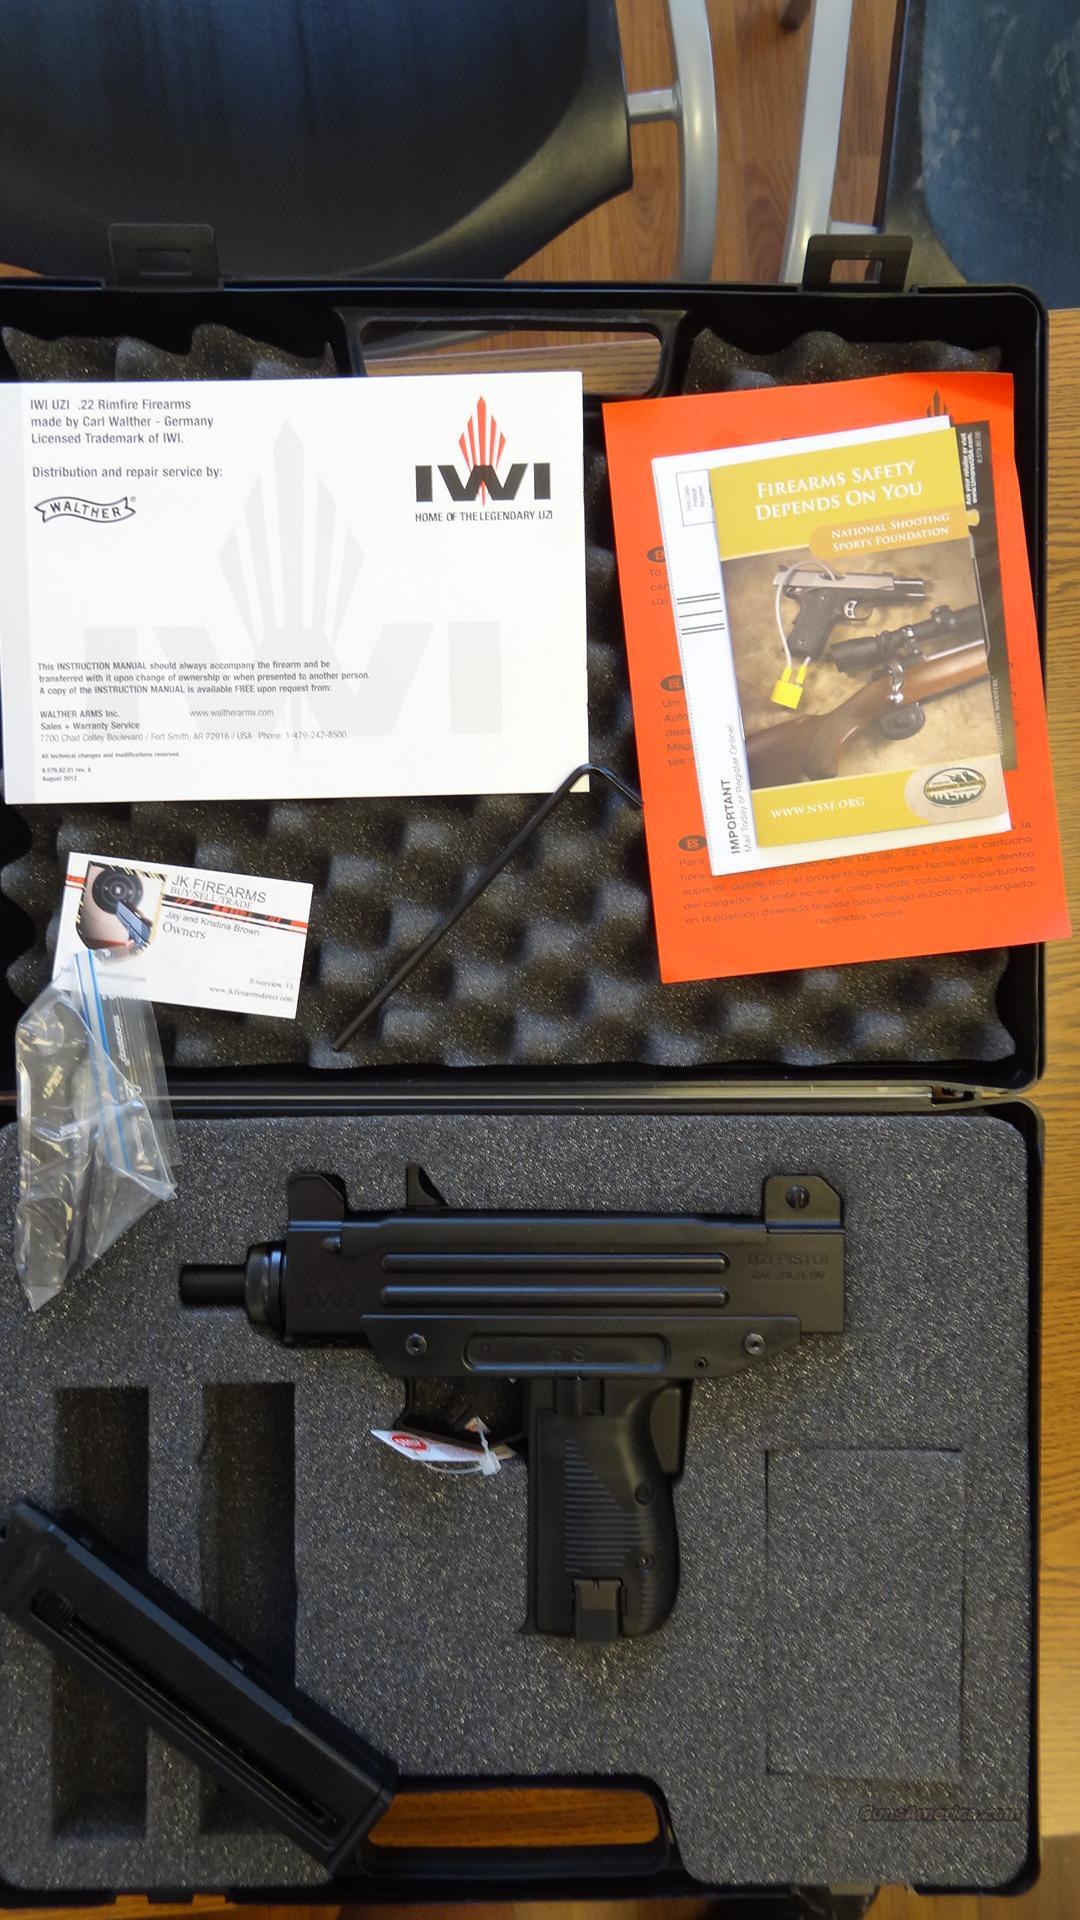 Uzi Pistol 22LR 20RD NIB Black by Walther